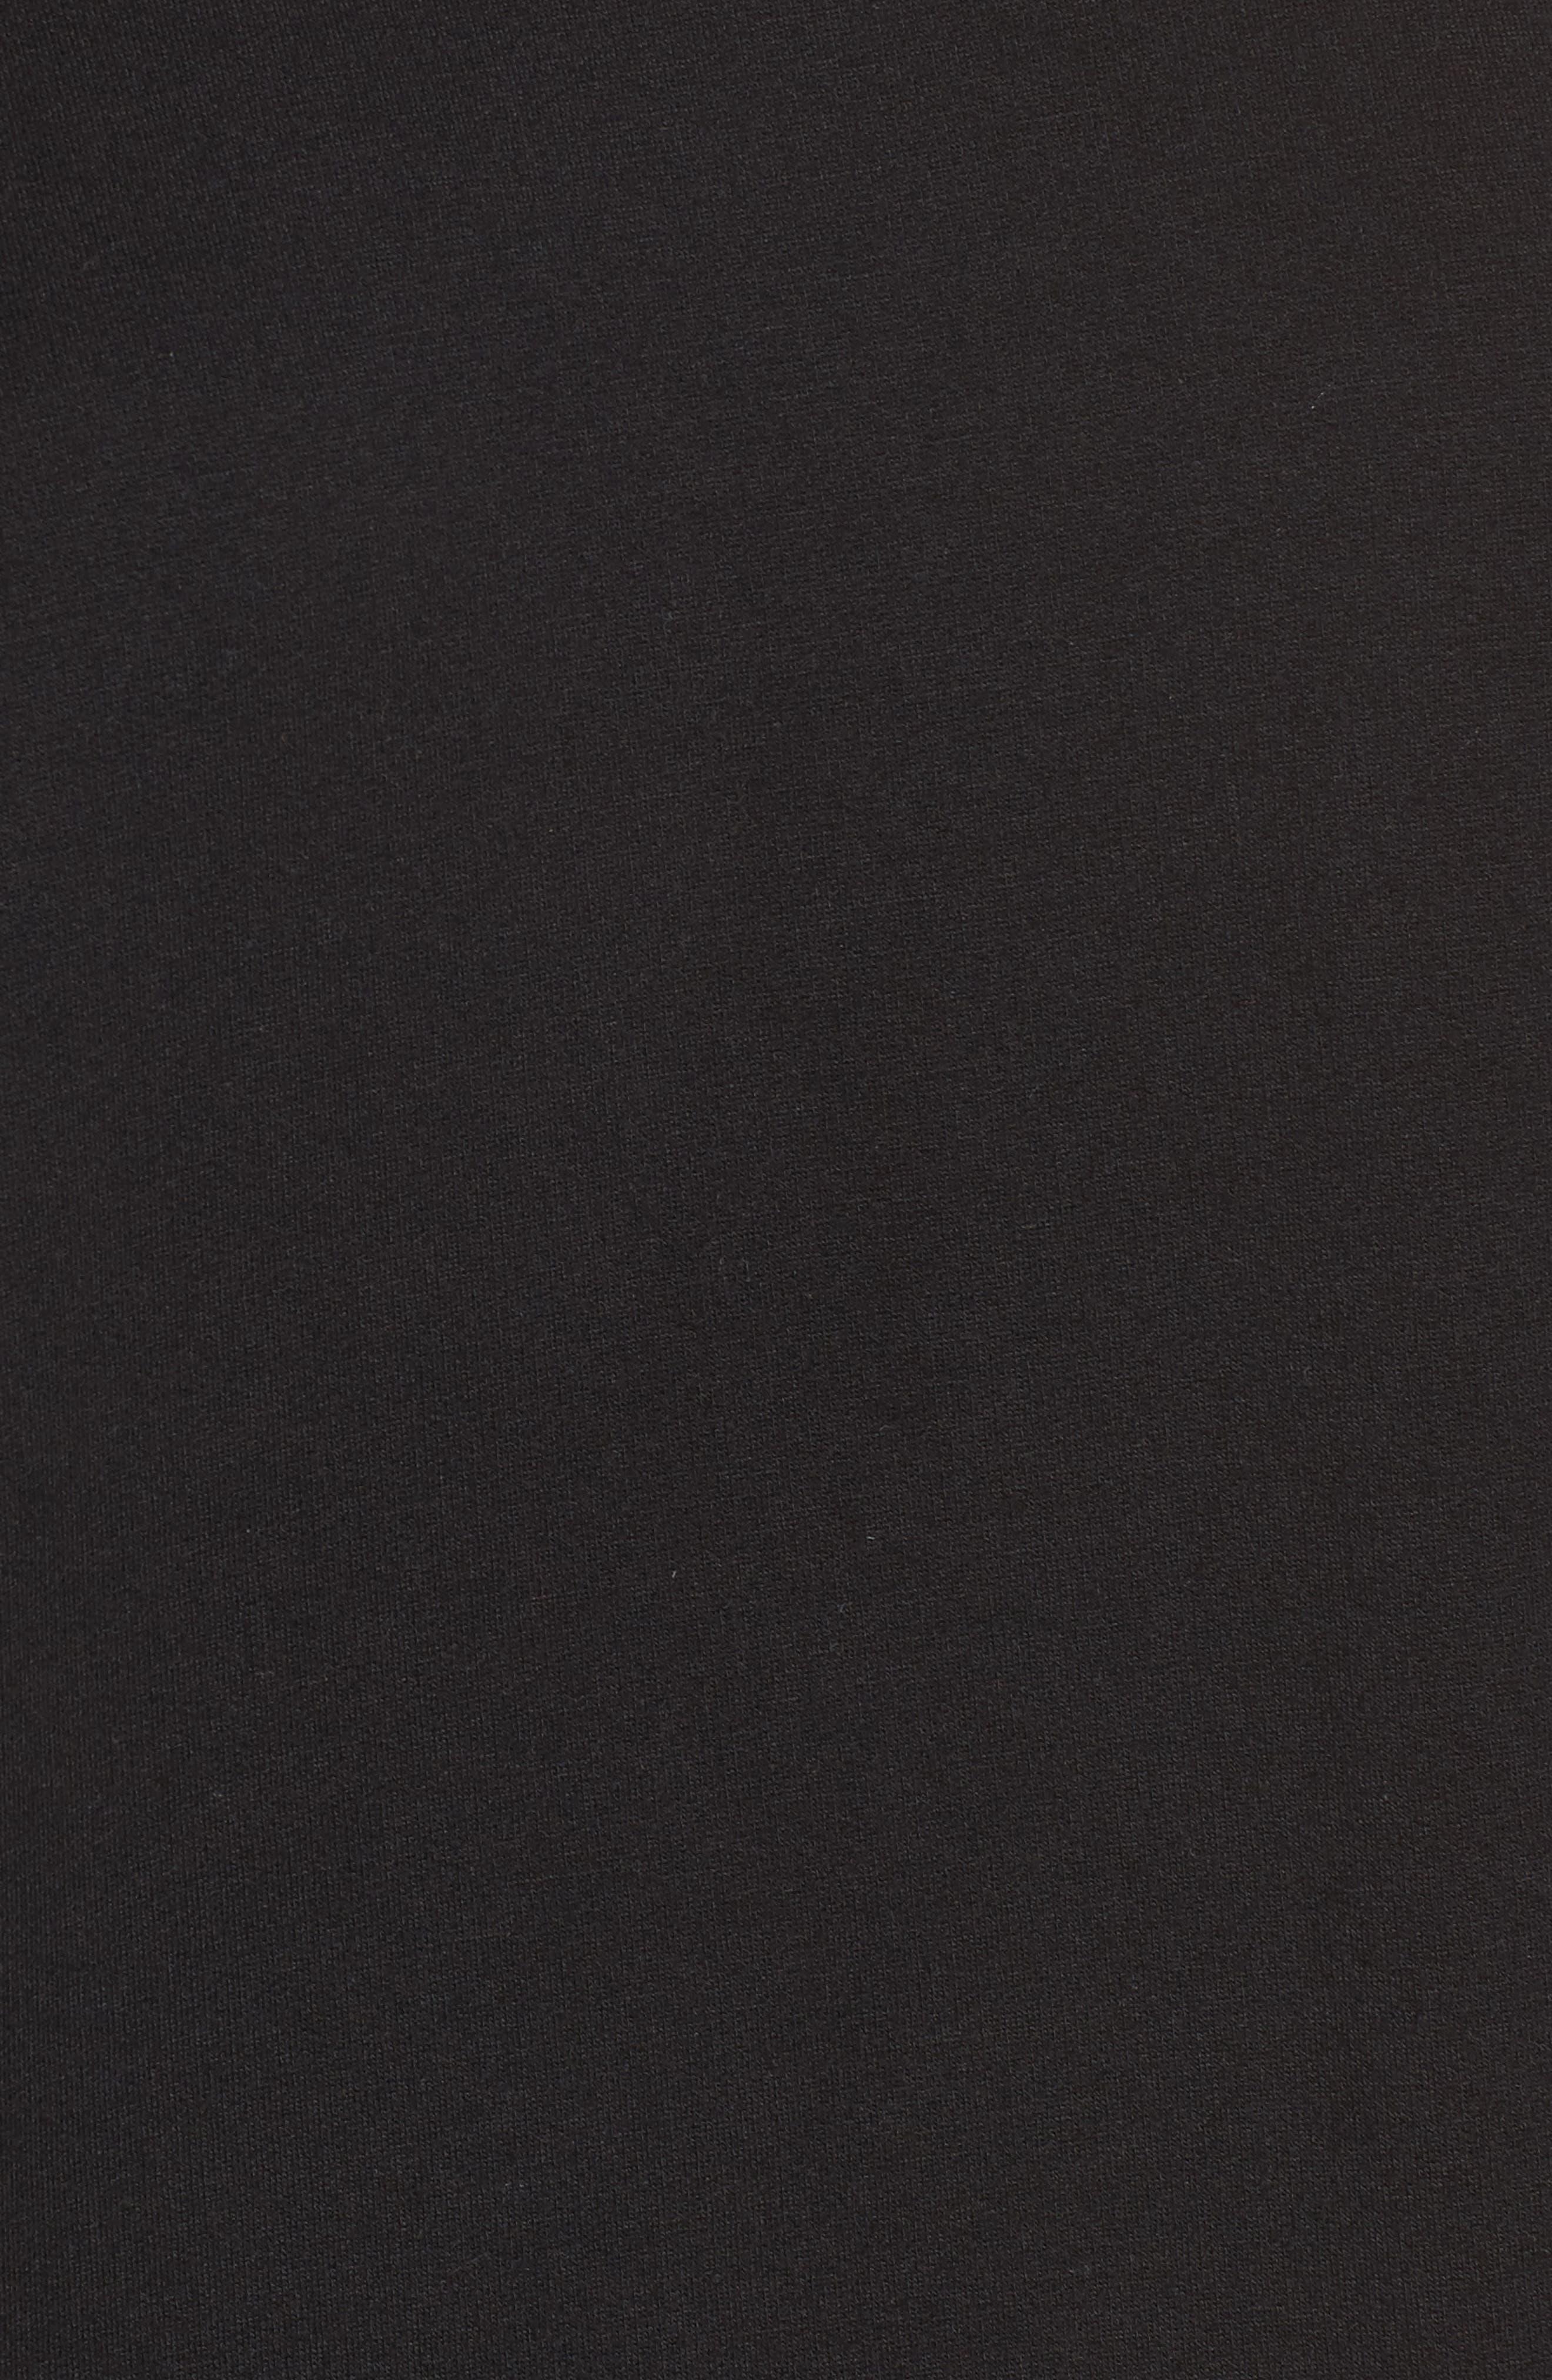 Stripe Trim Pullover,                             Alternate thumbnail 5, color,                             001